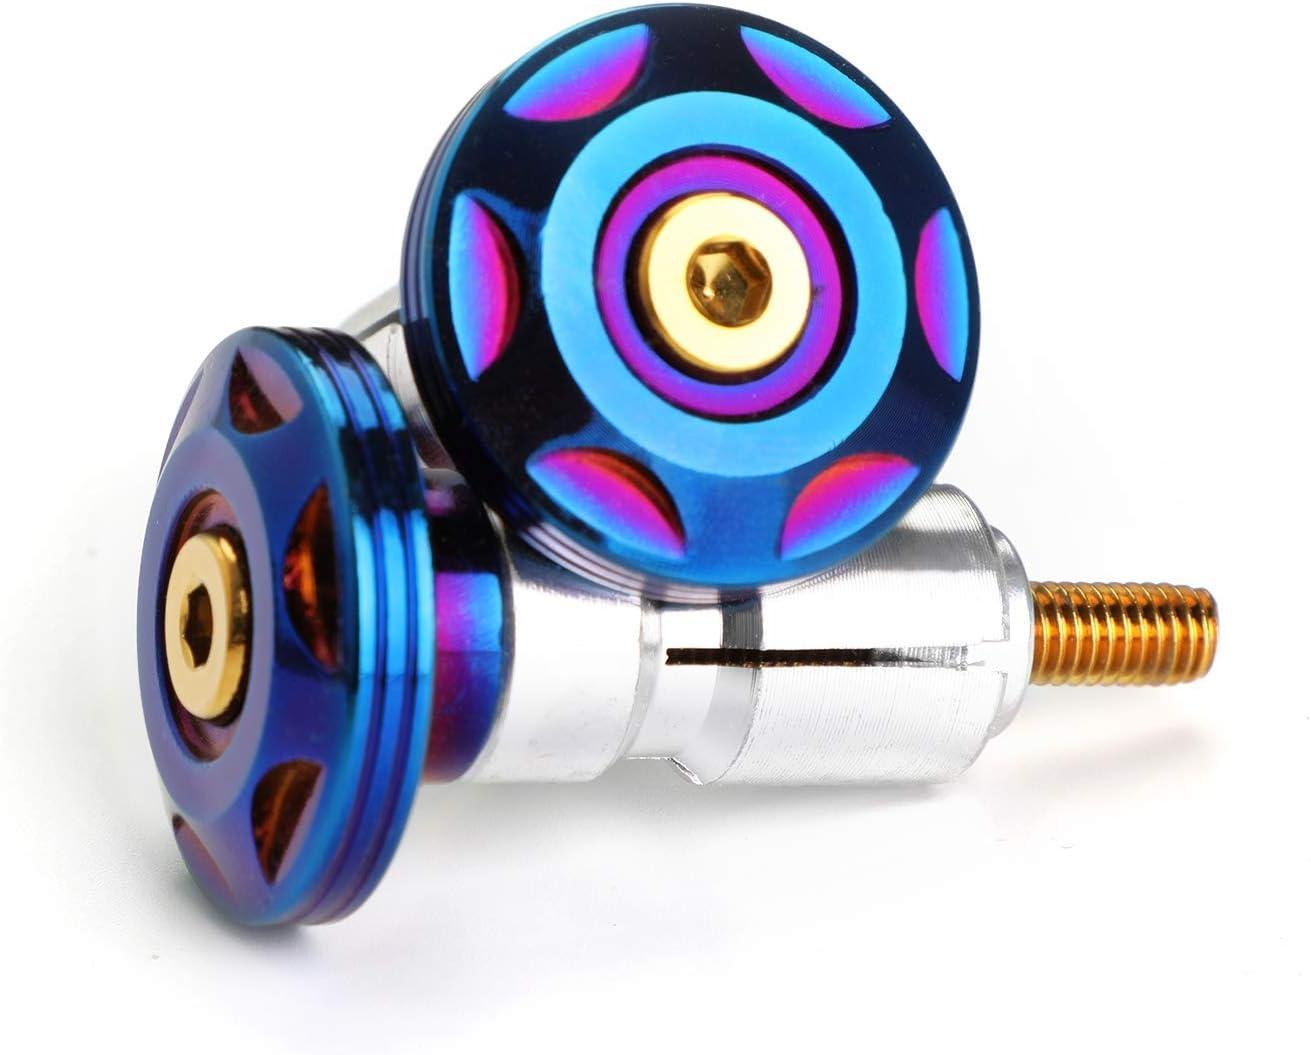 Areyourshop 7//8 22mm Blue-Gold Burnt Titanium Handle Bar Ends Vibration Reducing Grip Plugs